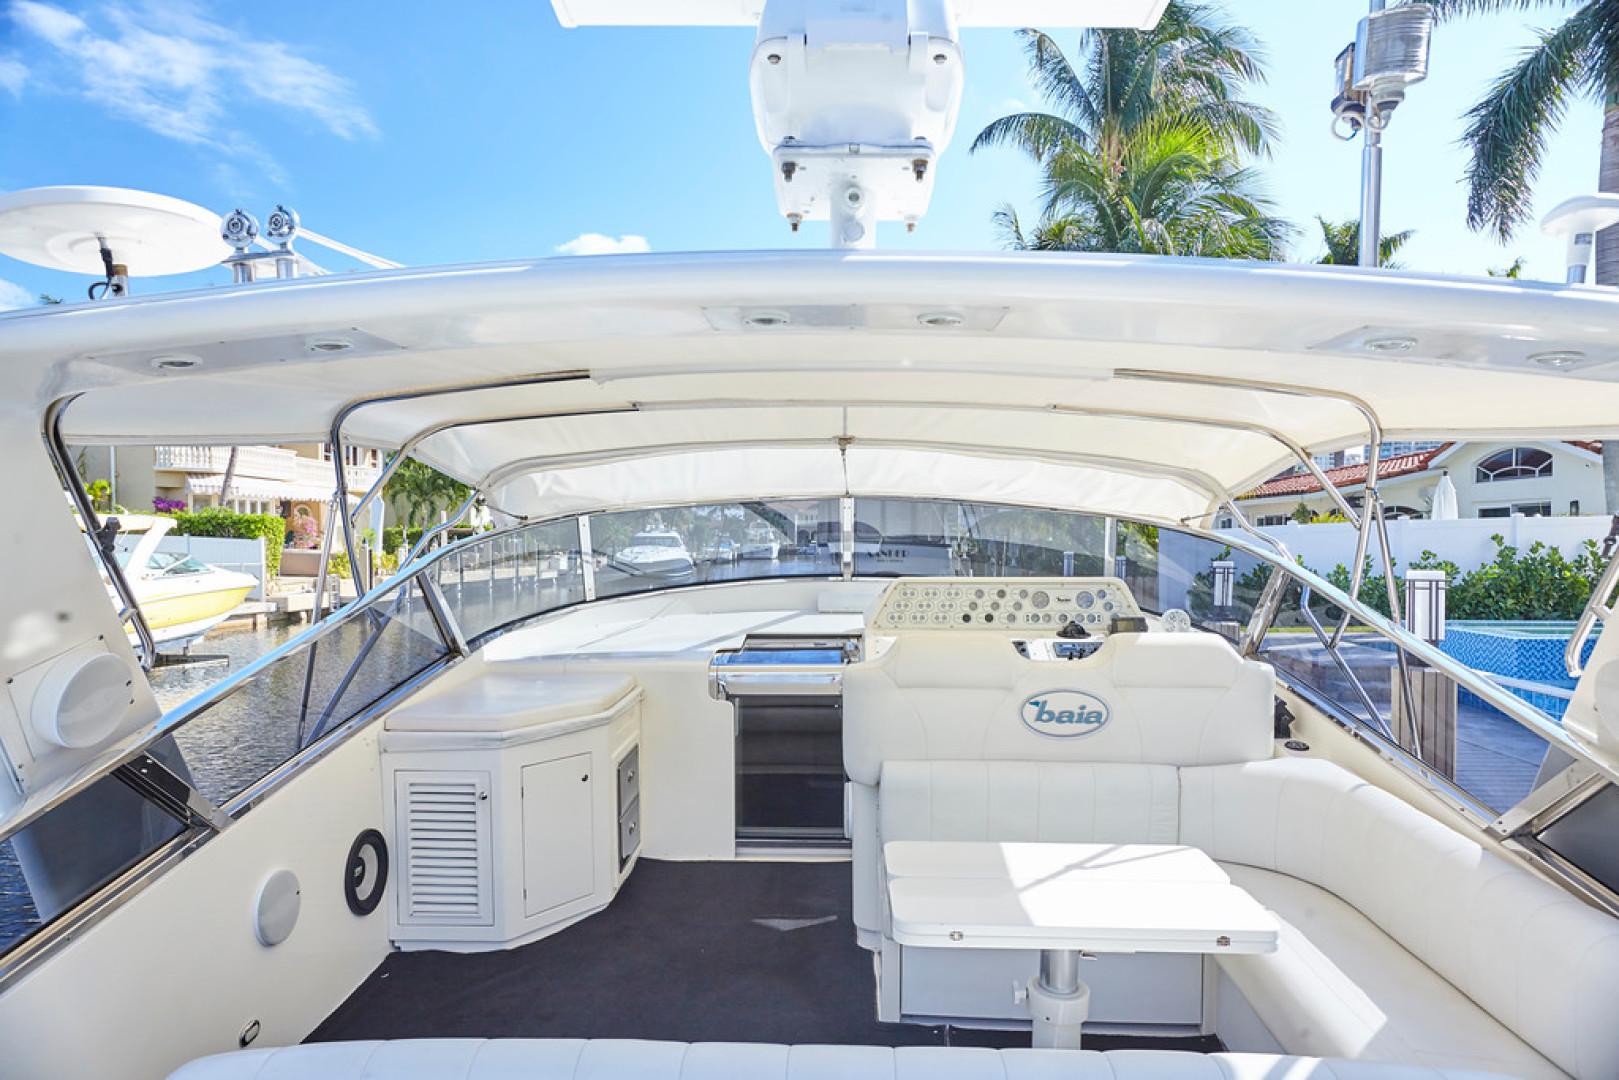 Baia-Sports Cruiser 1998 -Fort Lauderdale-Florida-United States-1275606 | Thumbnail